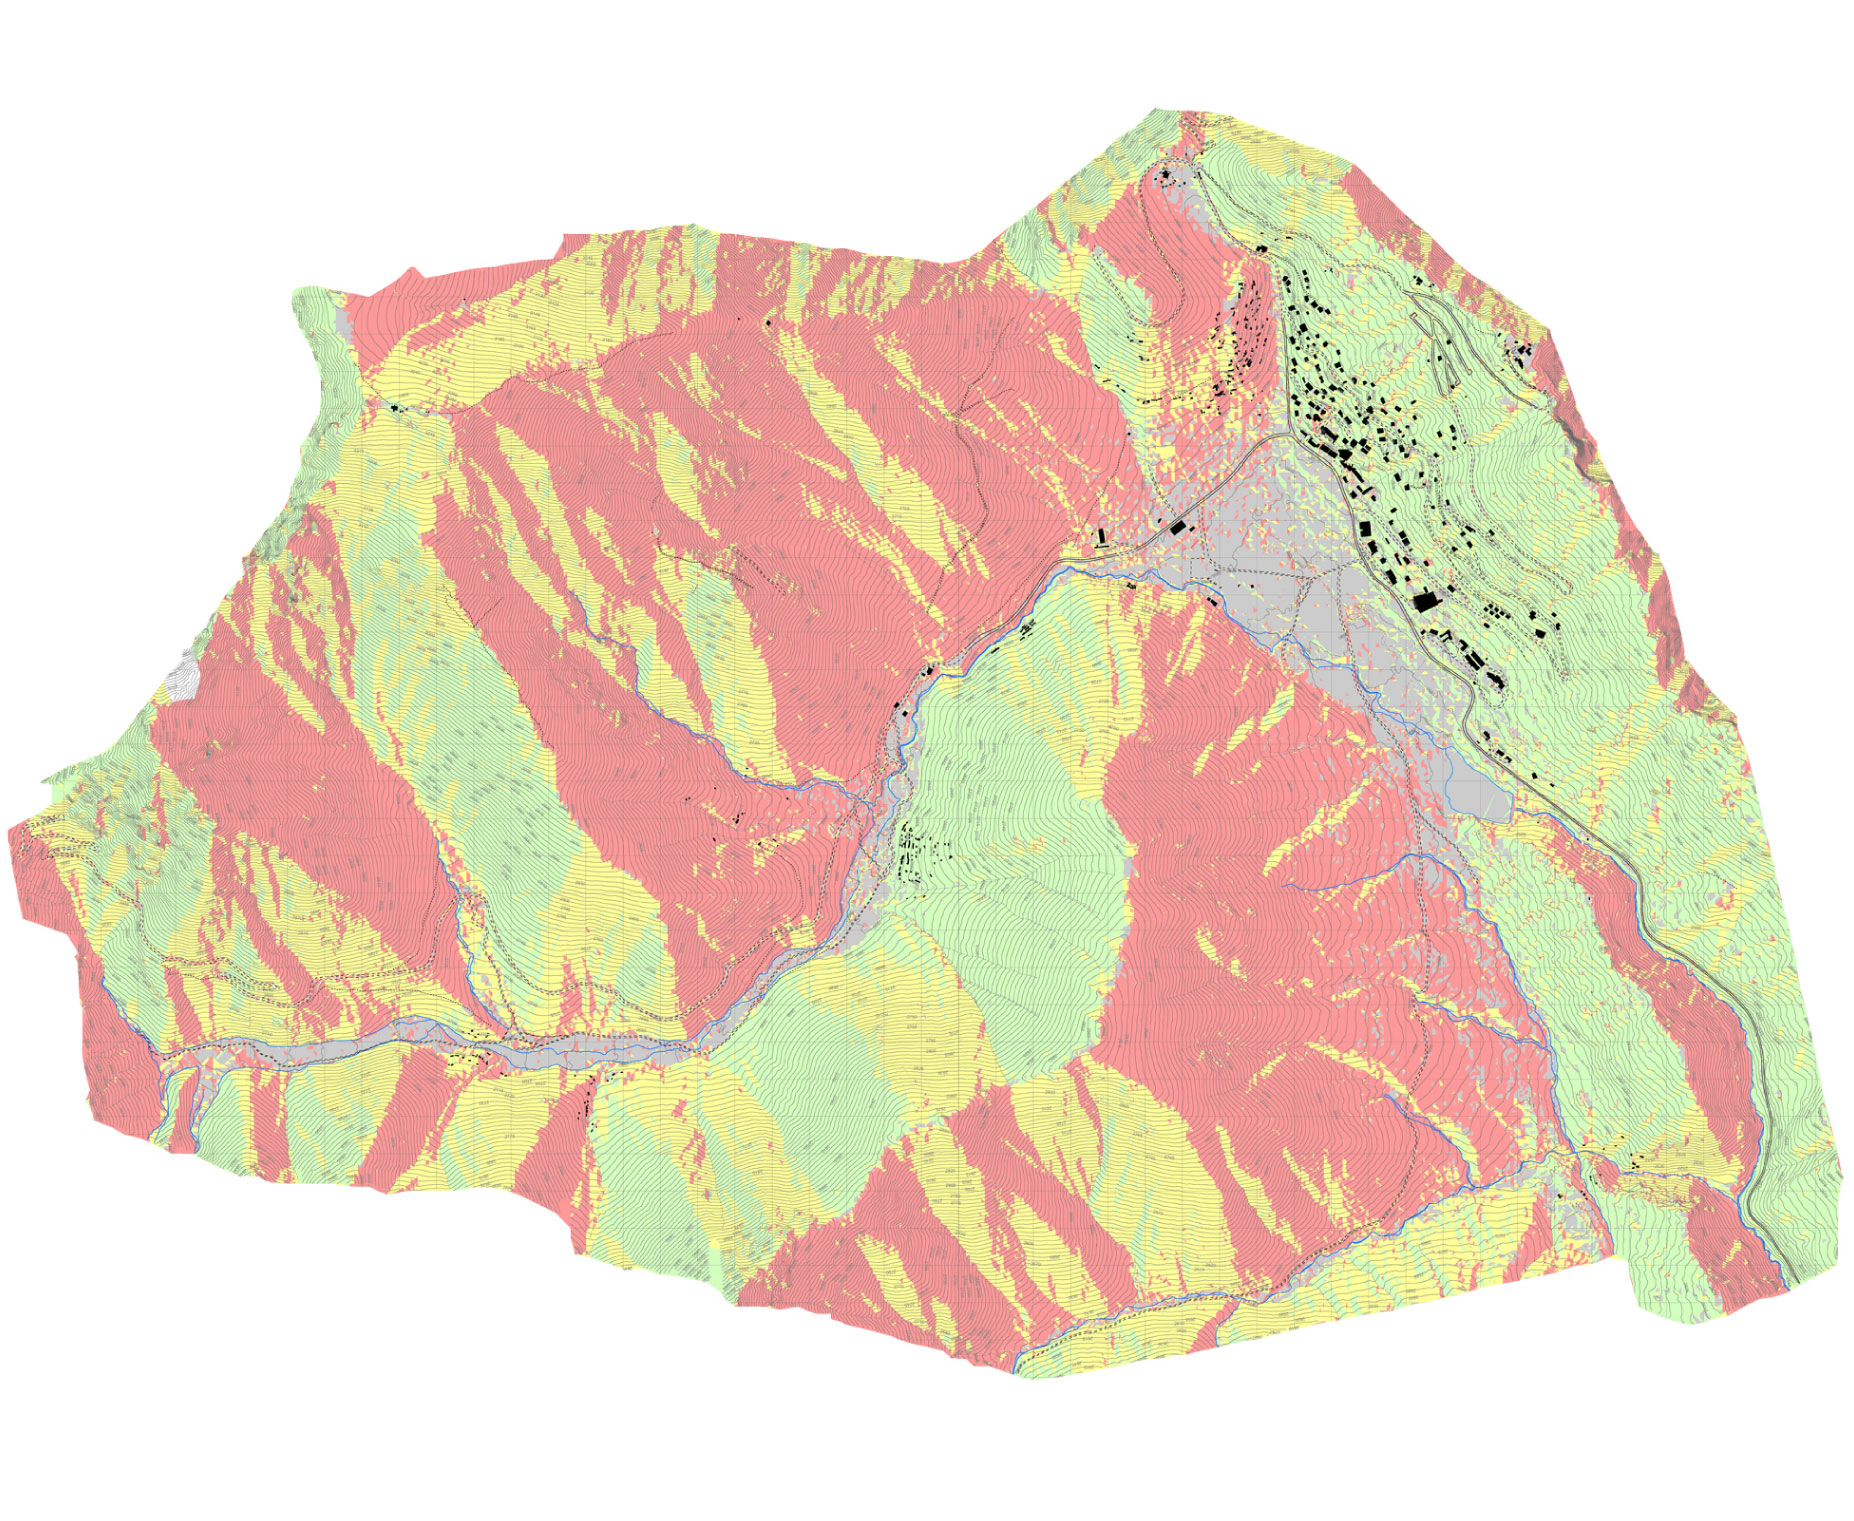 Resized - Land development.jpg